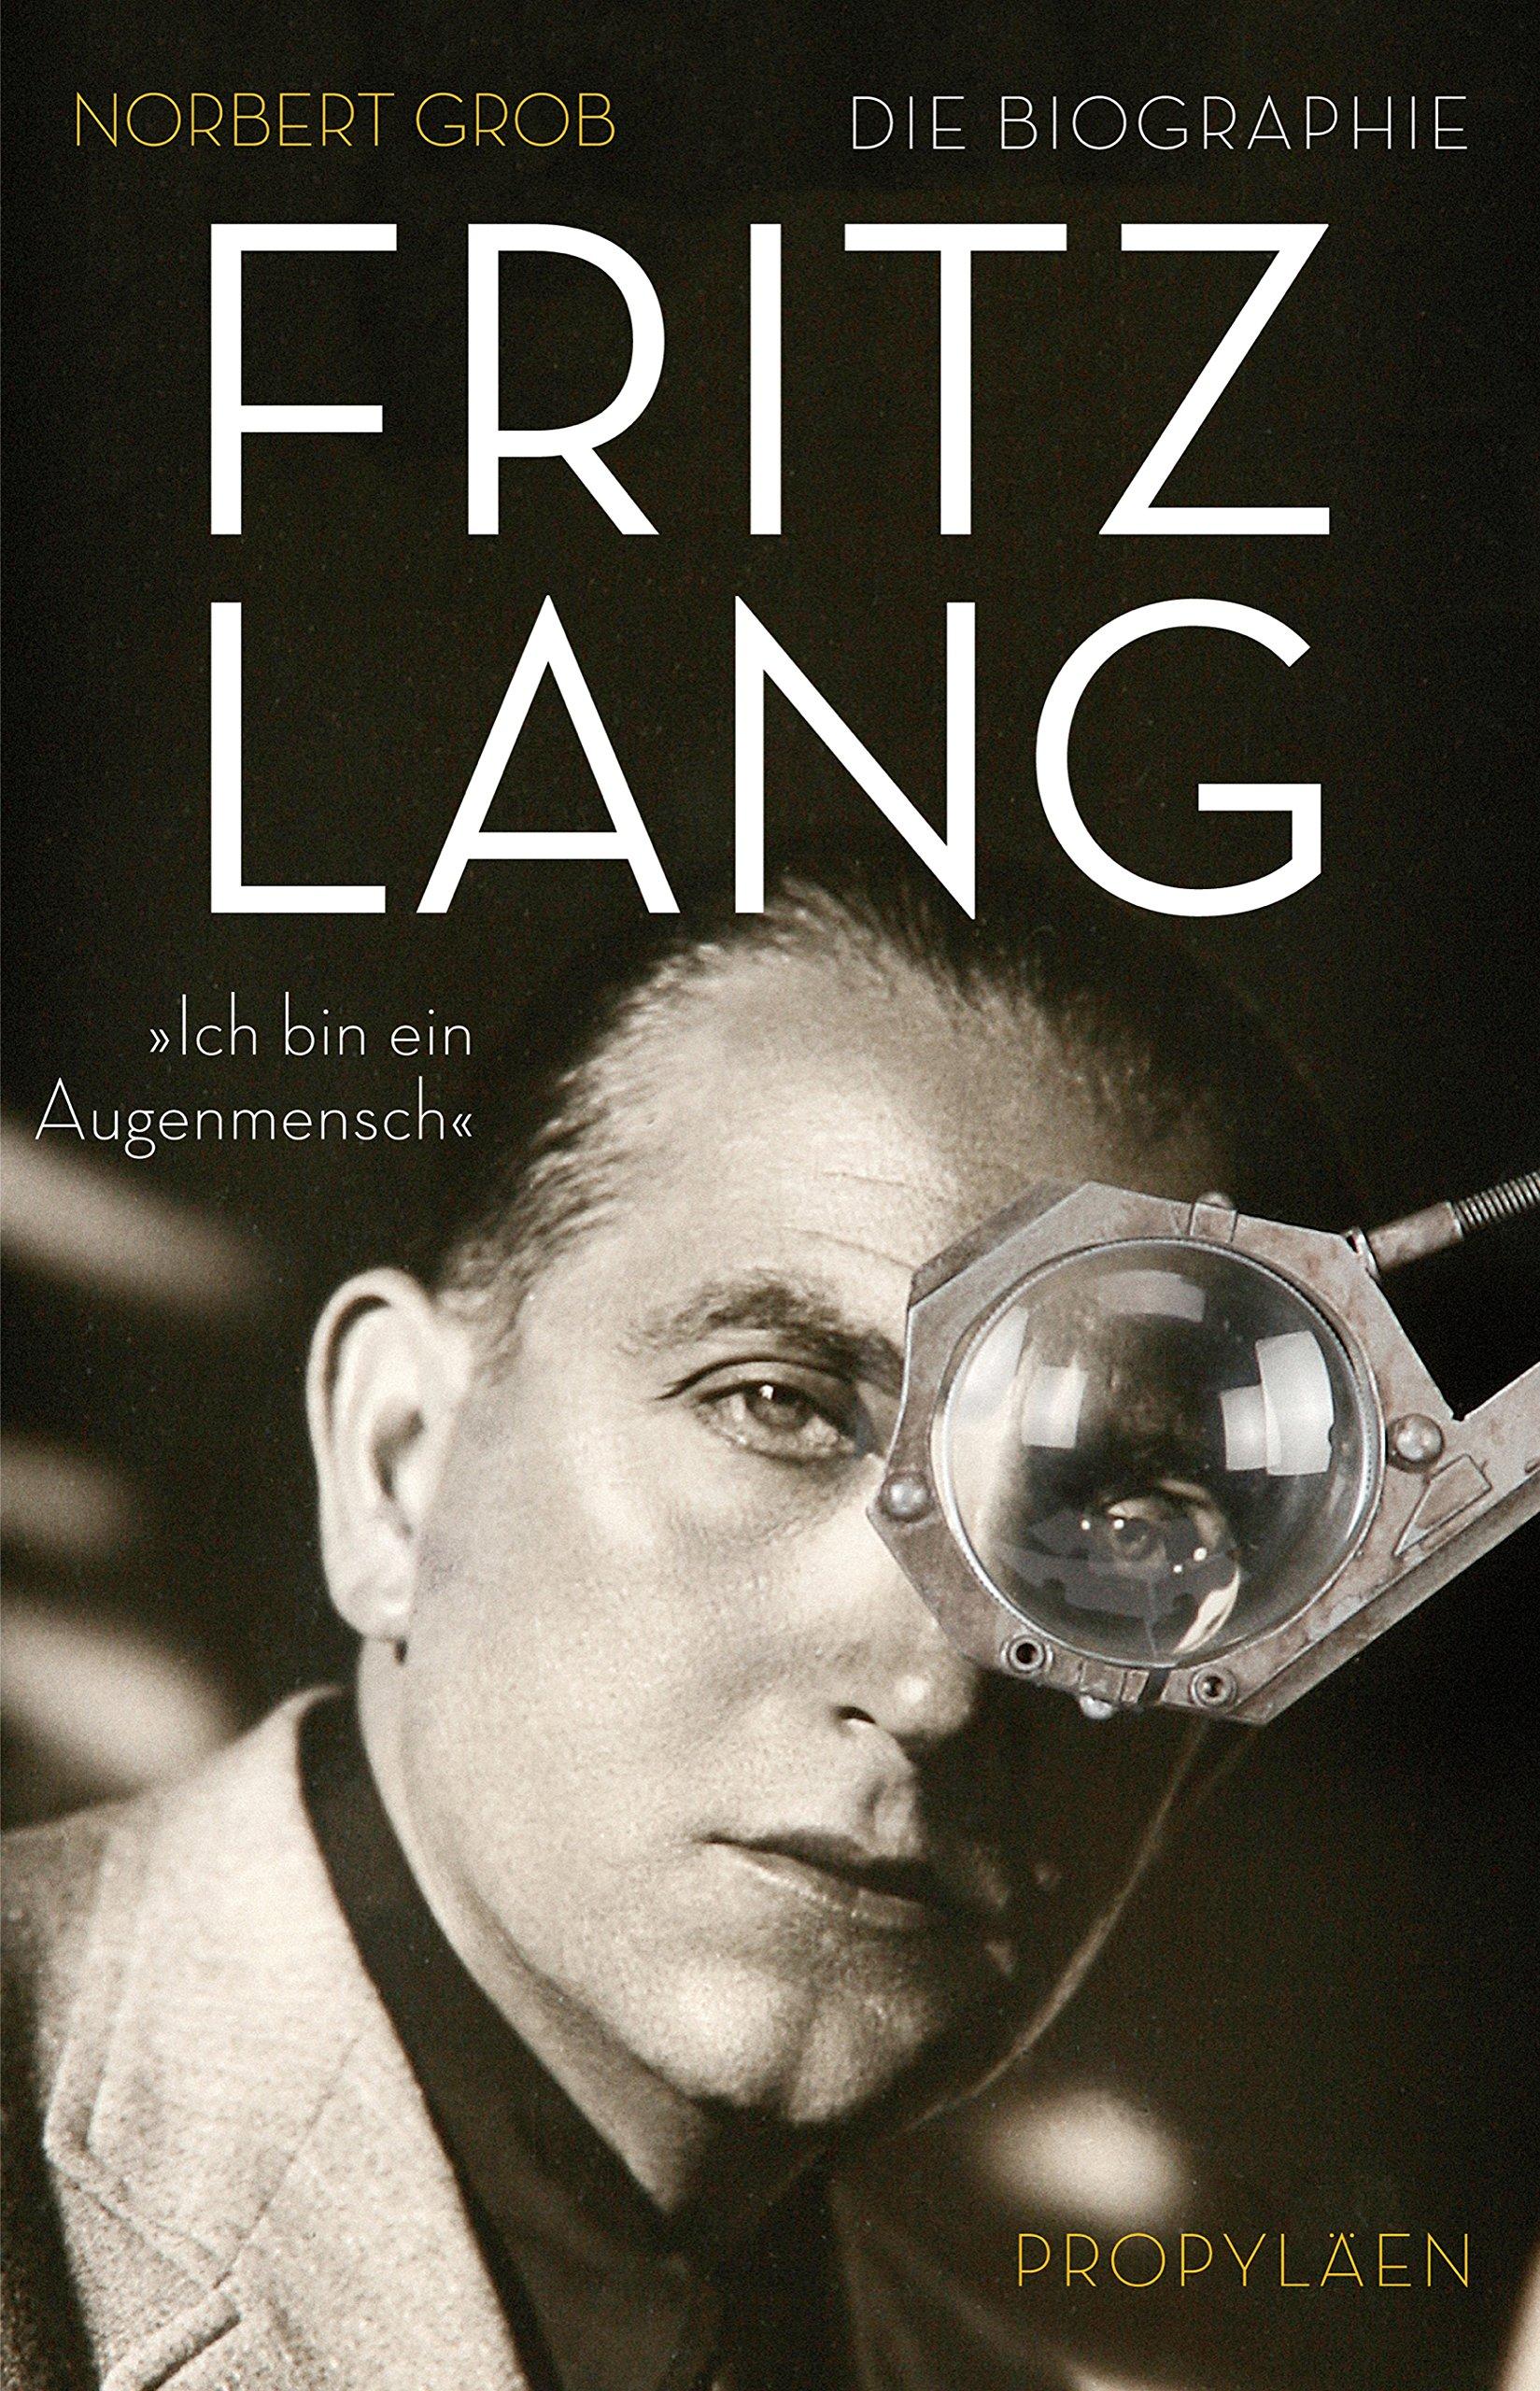 Fritz Lang: »Ich bin ein Augenmensch« Gebundenes Buch – 31. Oktober 2014 Norbert Grob Propyläen Verlag 3549074239 Belletristik / Biographien